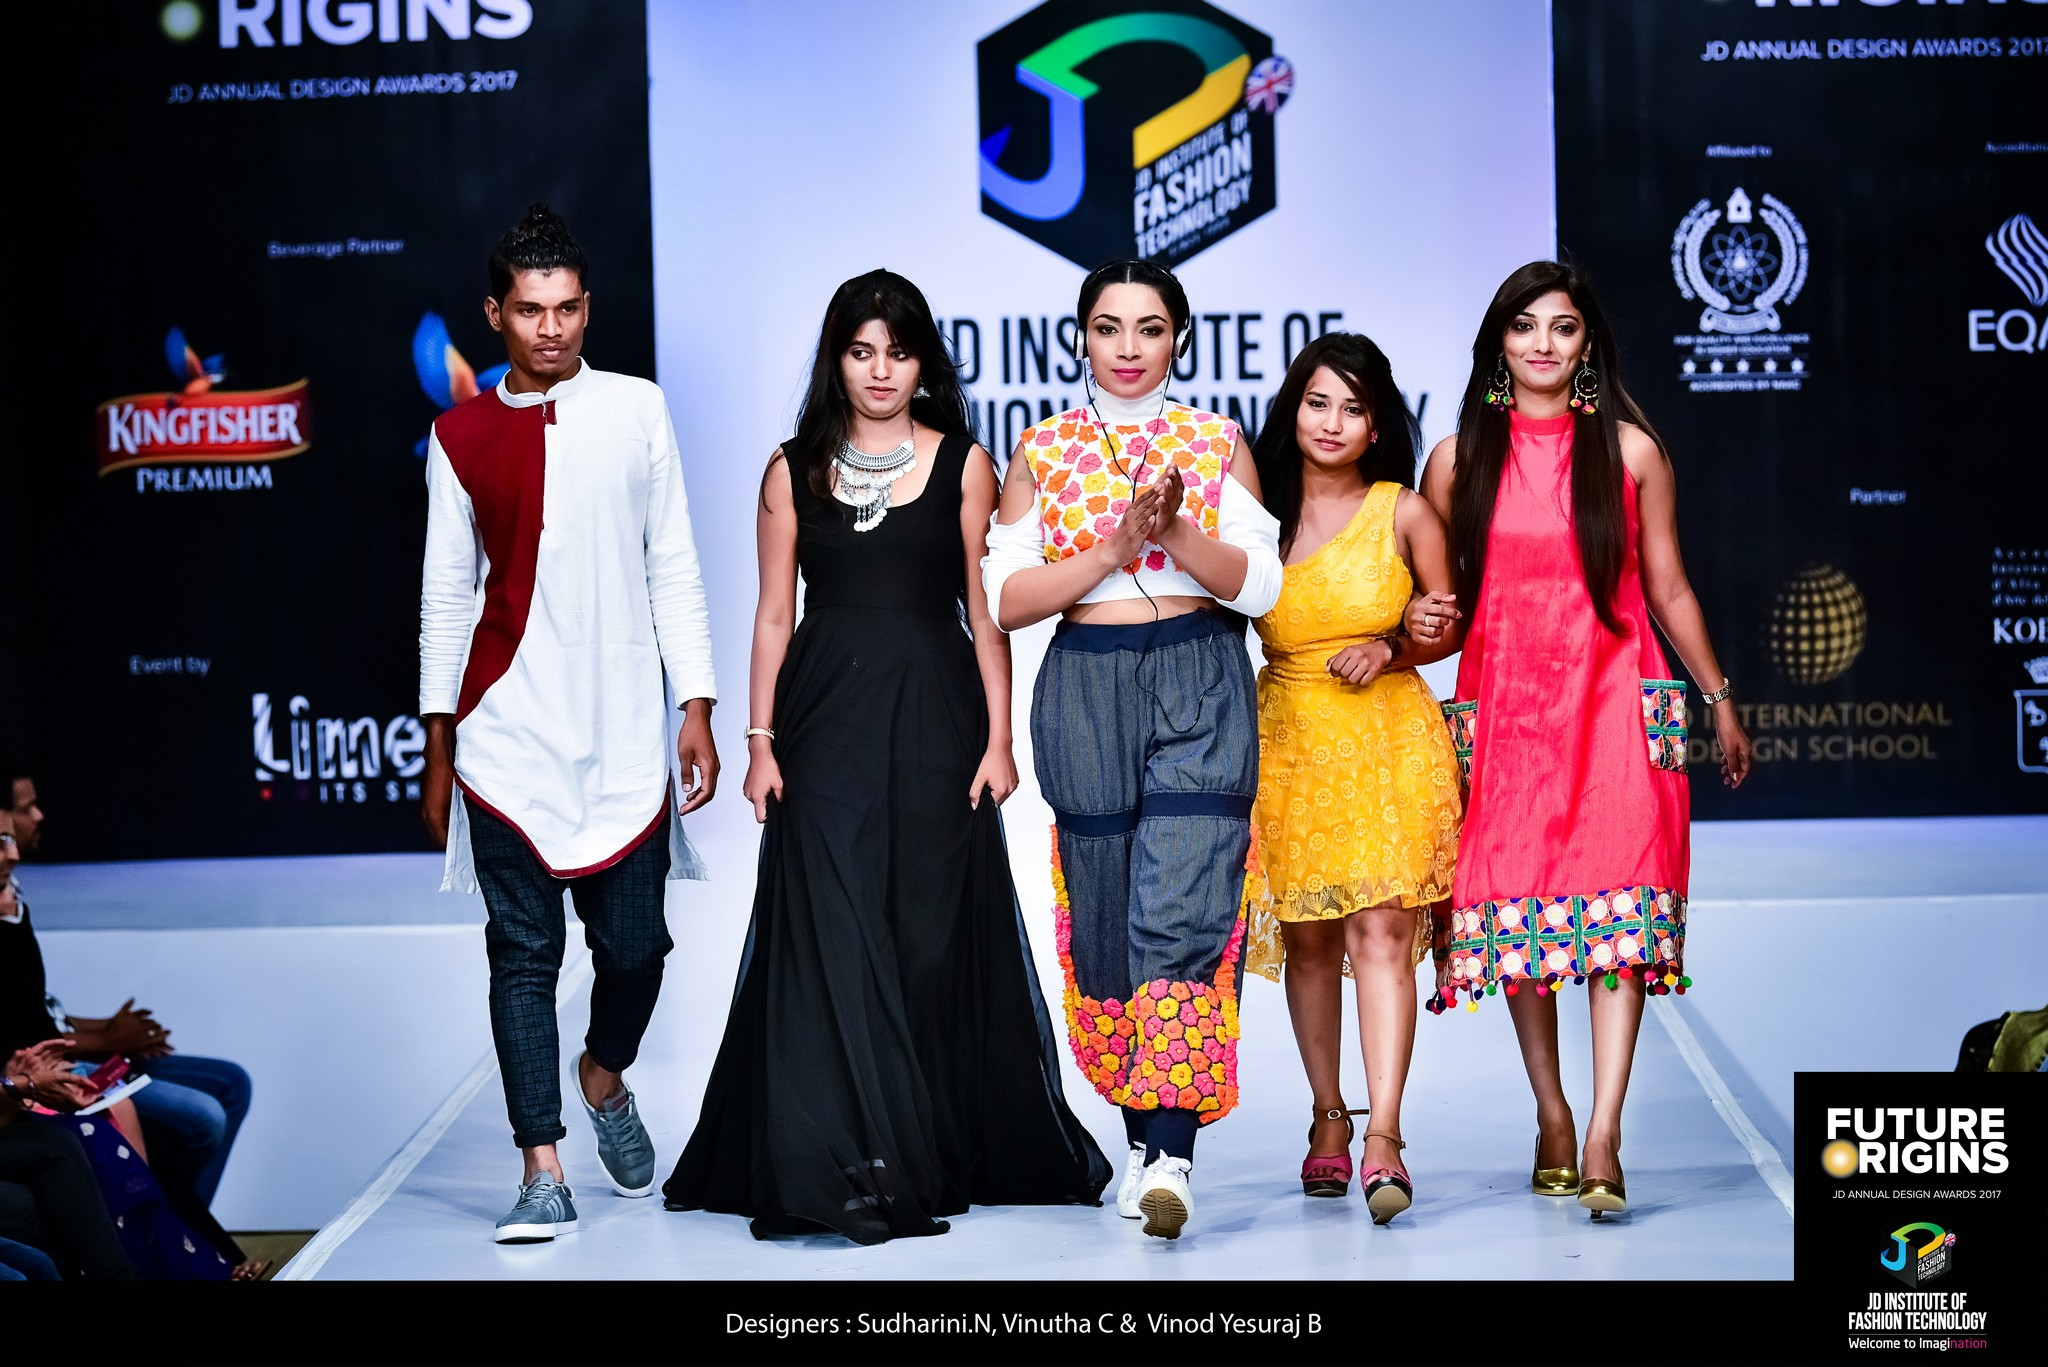 Boho Nomads - Future Origin - JD Annual Design Awards 2017 | Photography : Jerin Nath (@jerin_nath) boho nomads - Boho Nomads     Future Origin     JD Annual Design Awards 2017 5 - Boho Nomads – Future Origin – JD Annual Design Awards 2017